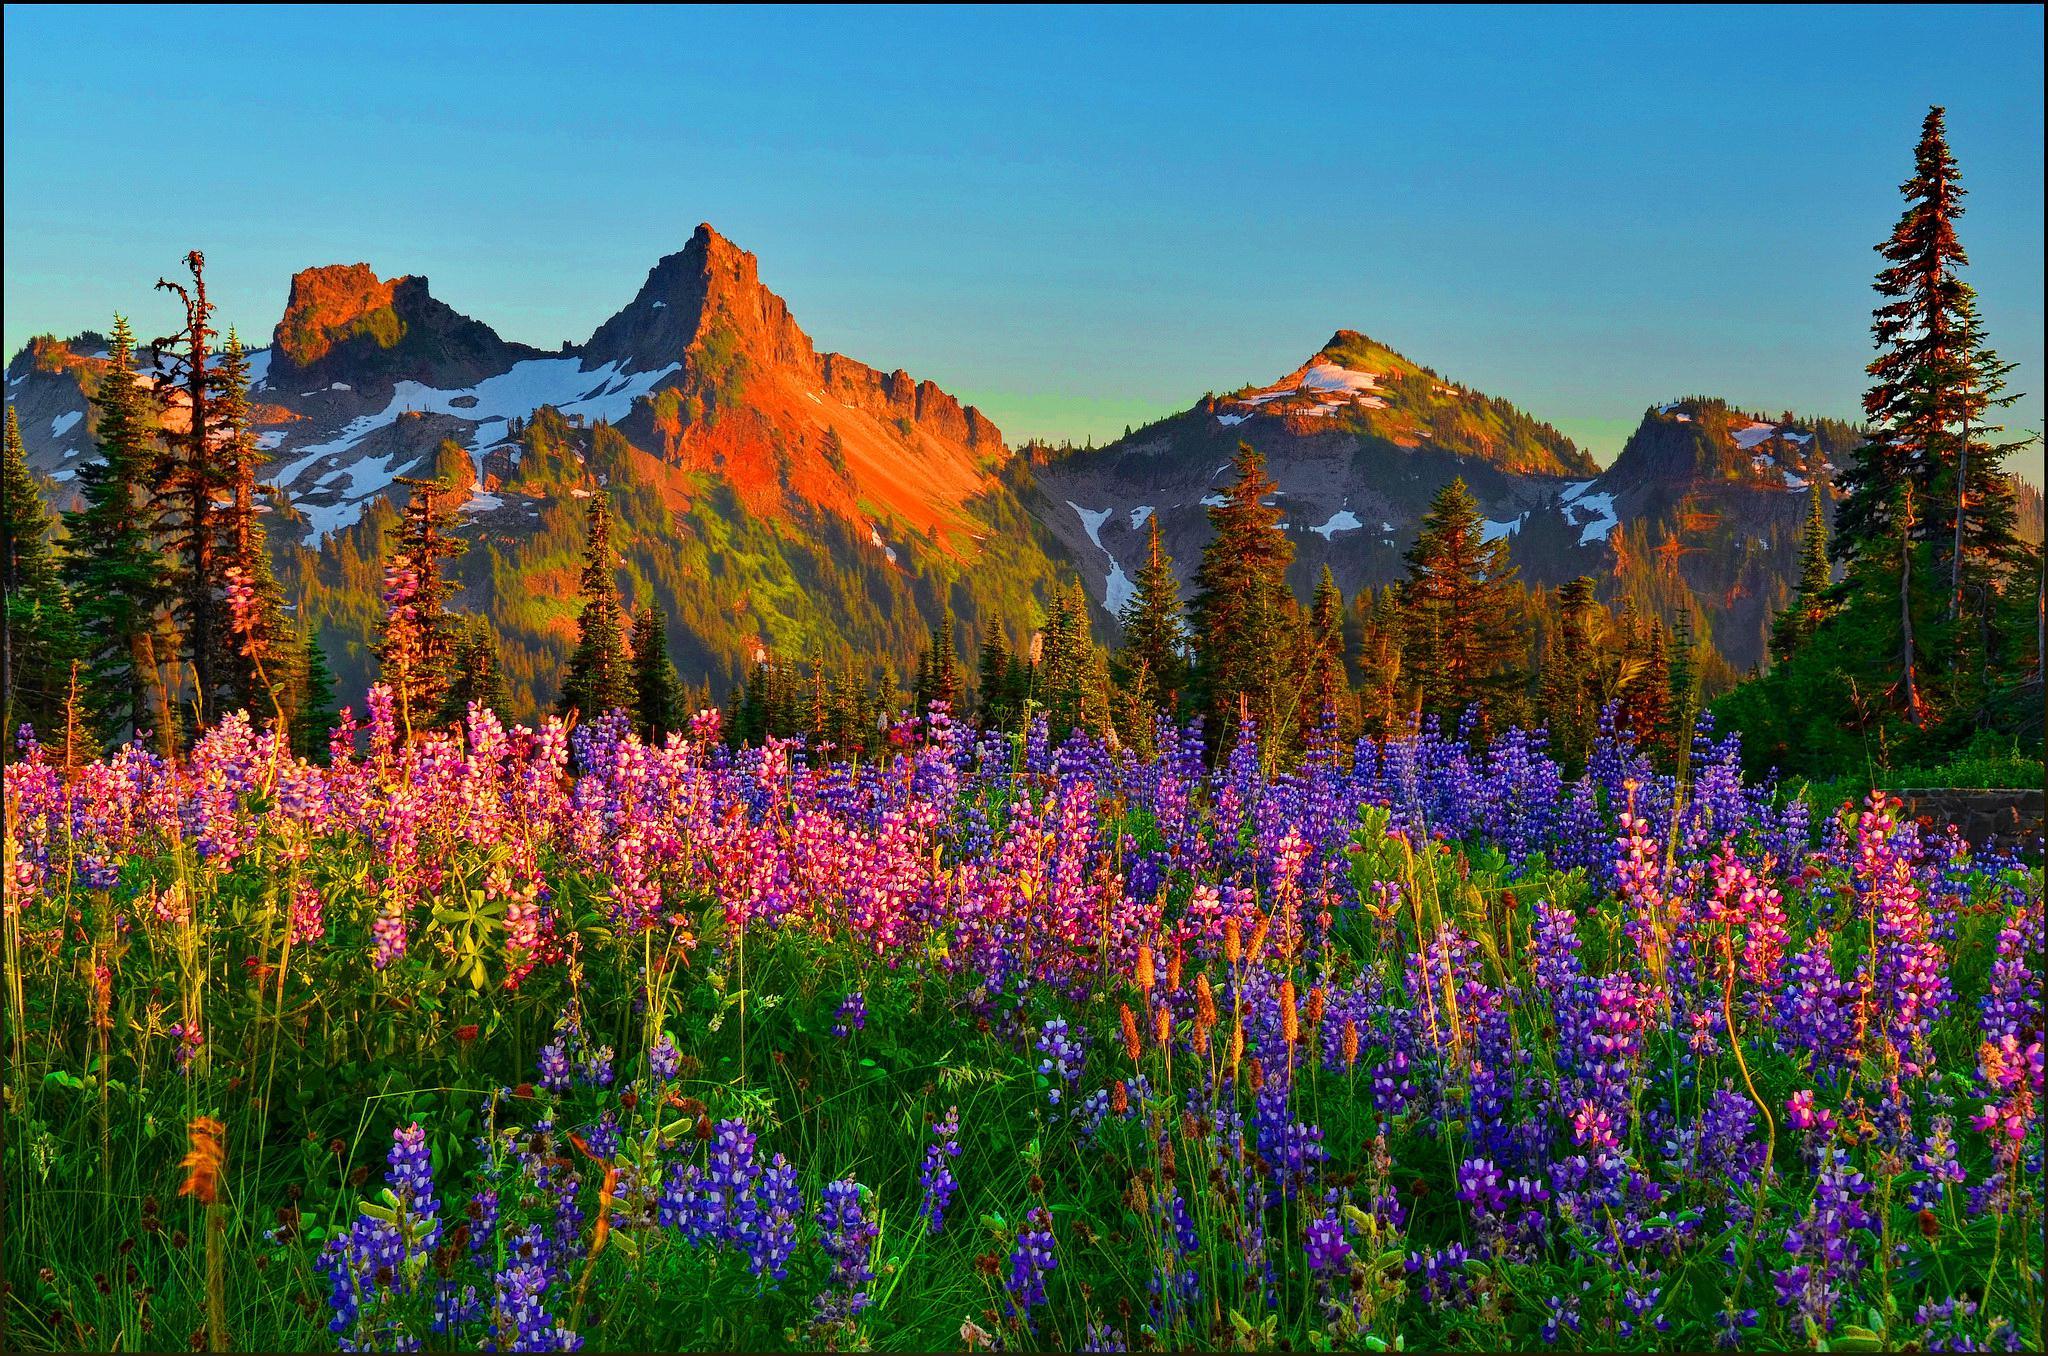 Summer Wildflowers Wallpaper